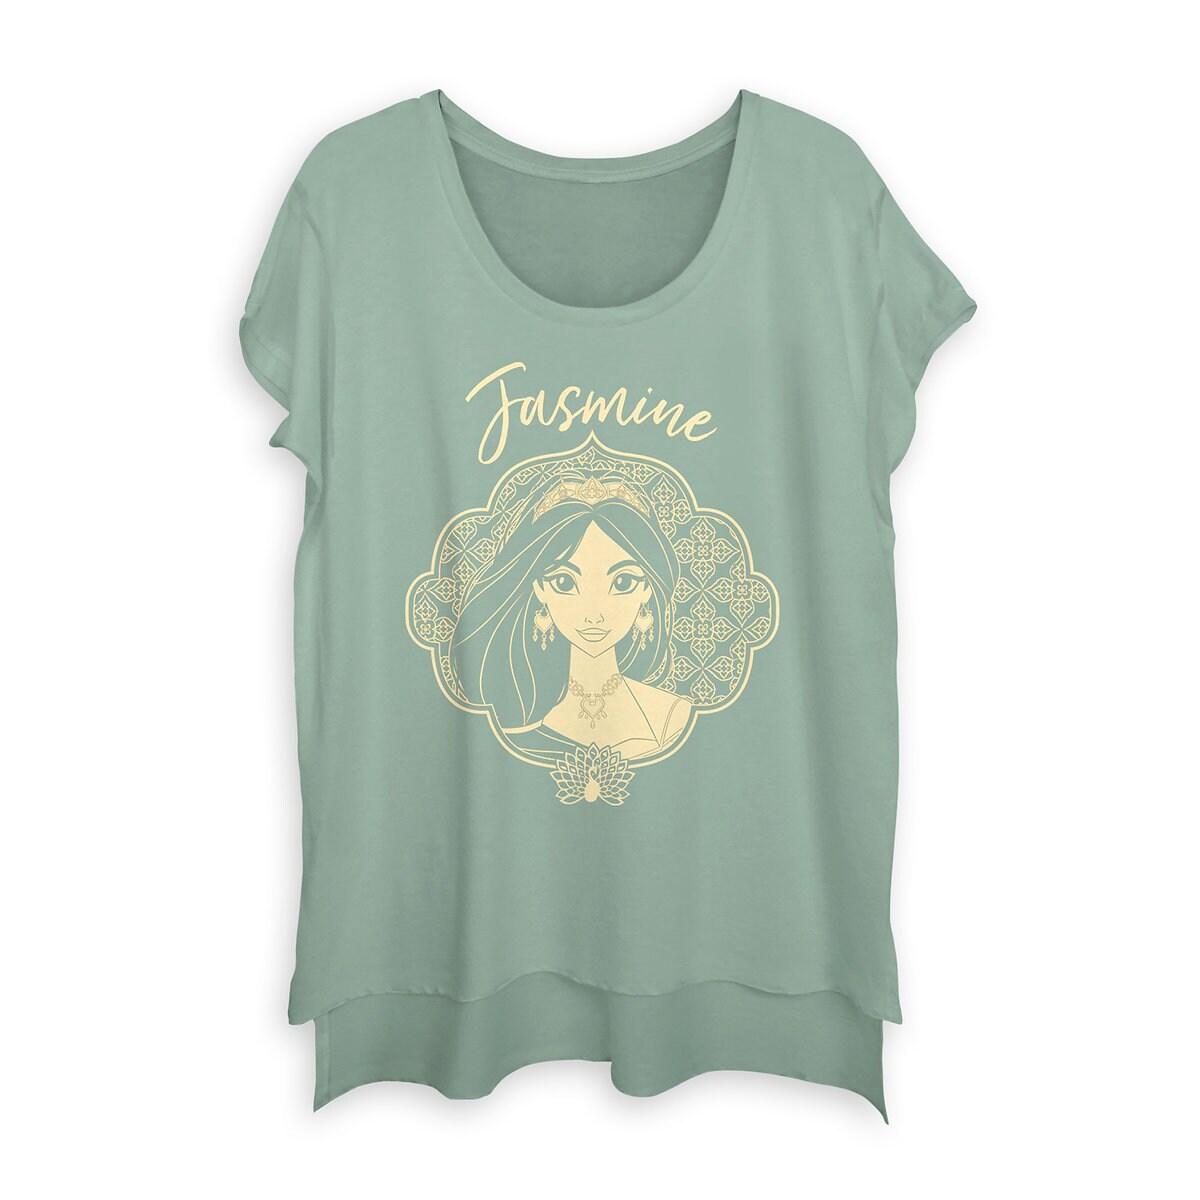 ed834c07 Jasmine Fashion T-Shirt for Juniors - Aladdin - Live Action Film